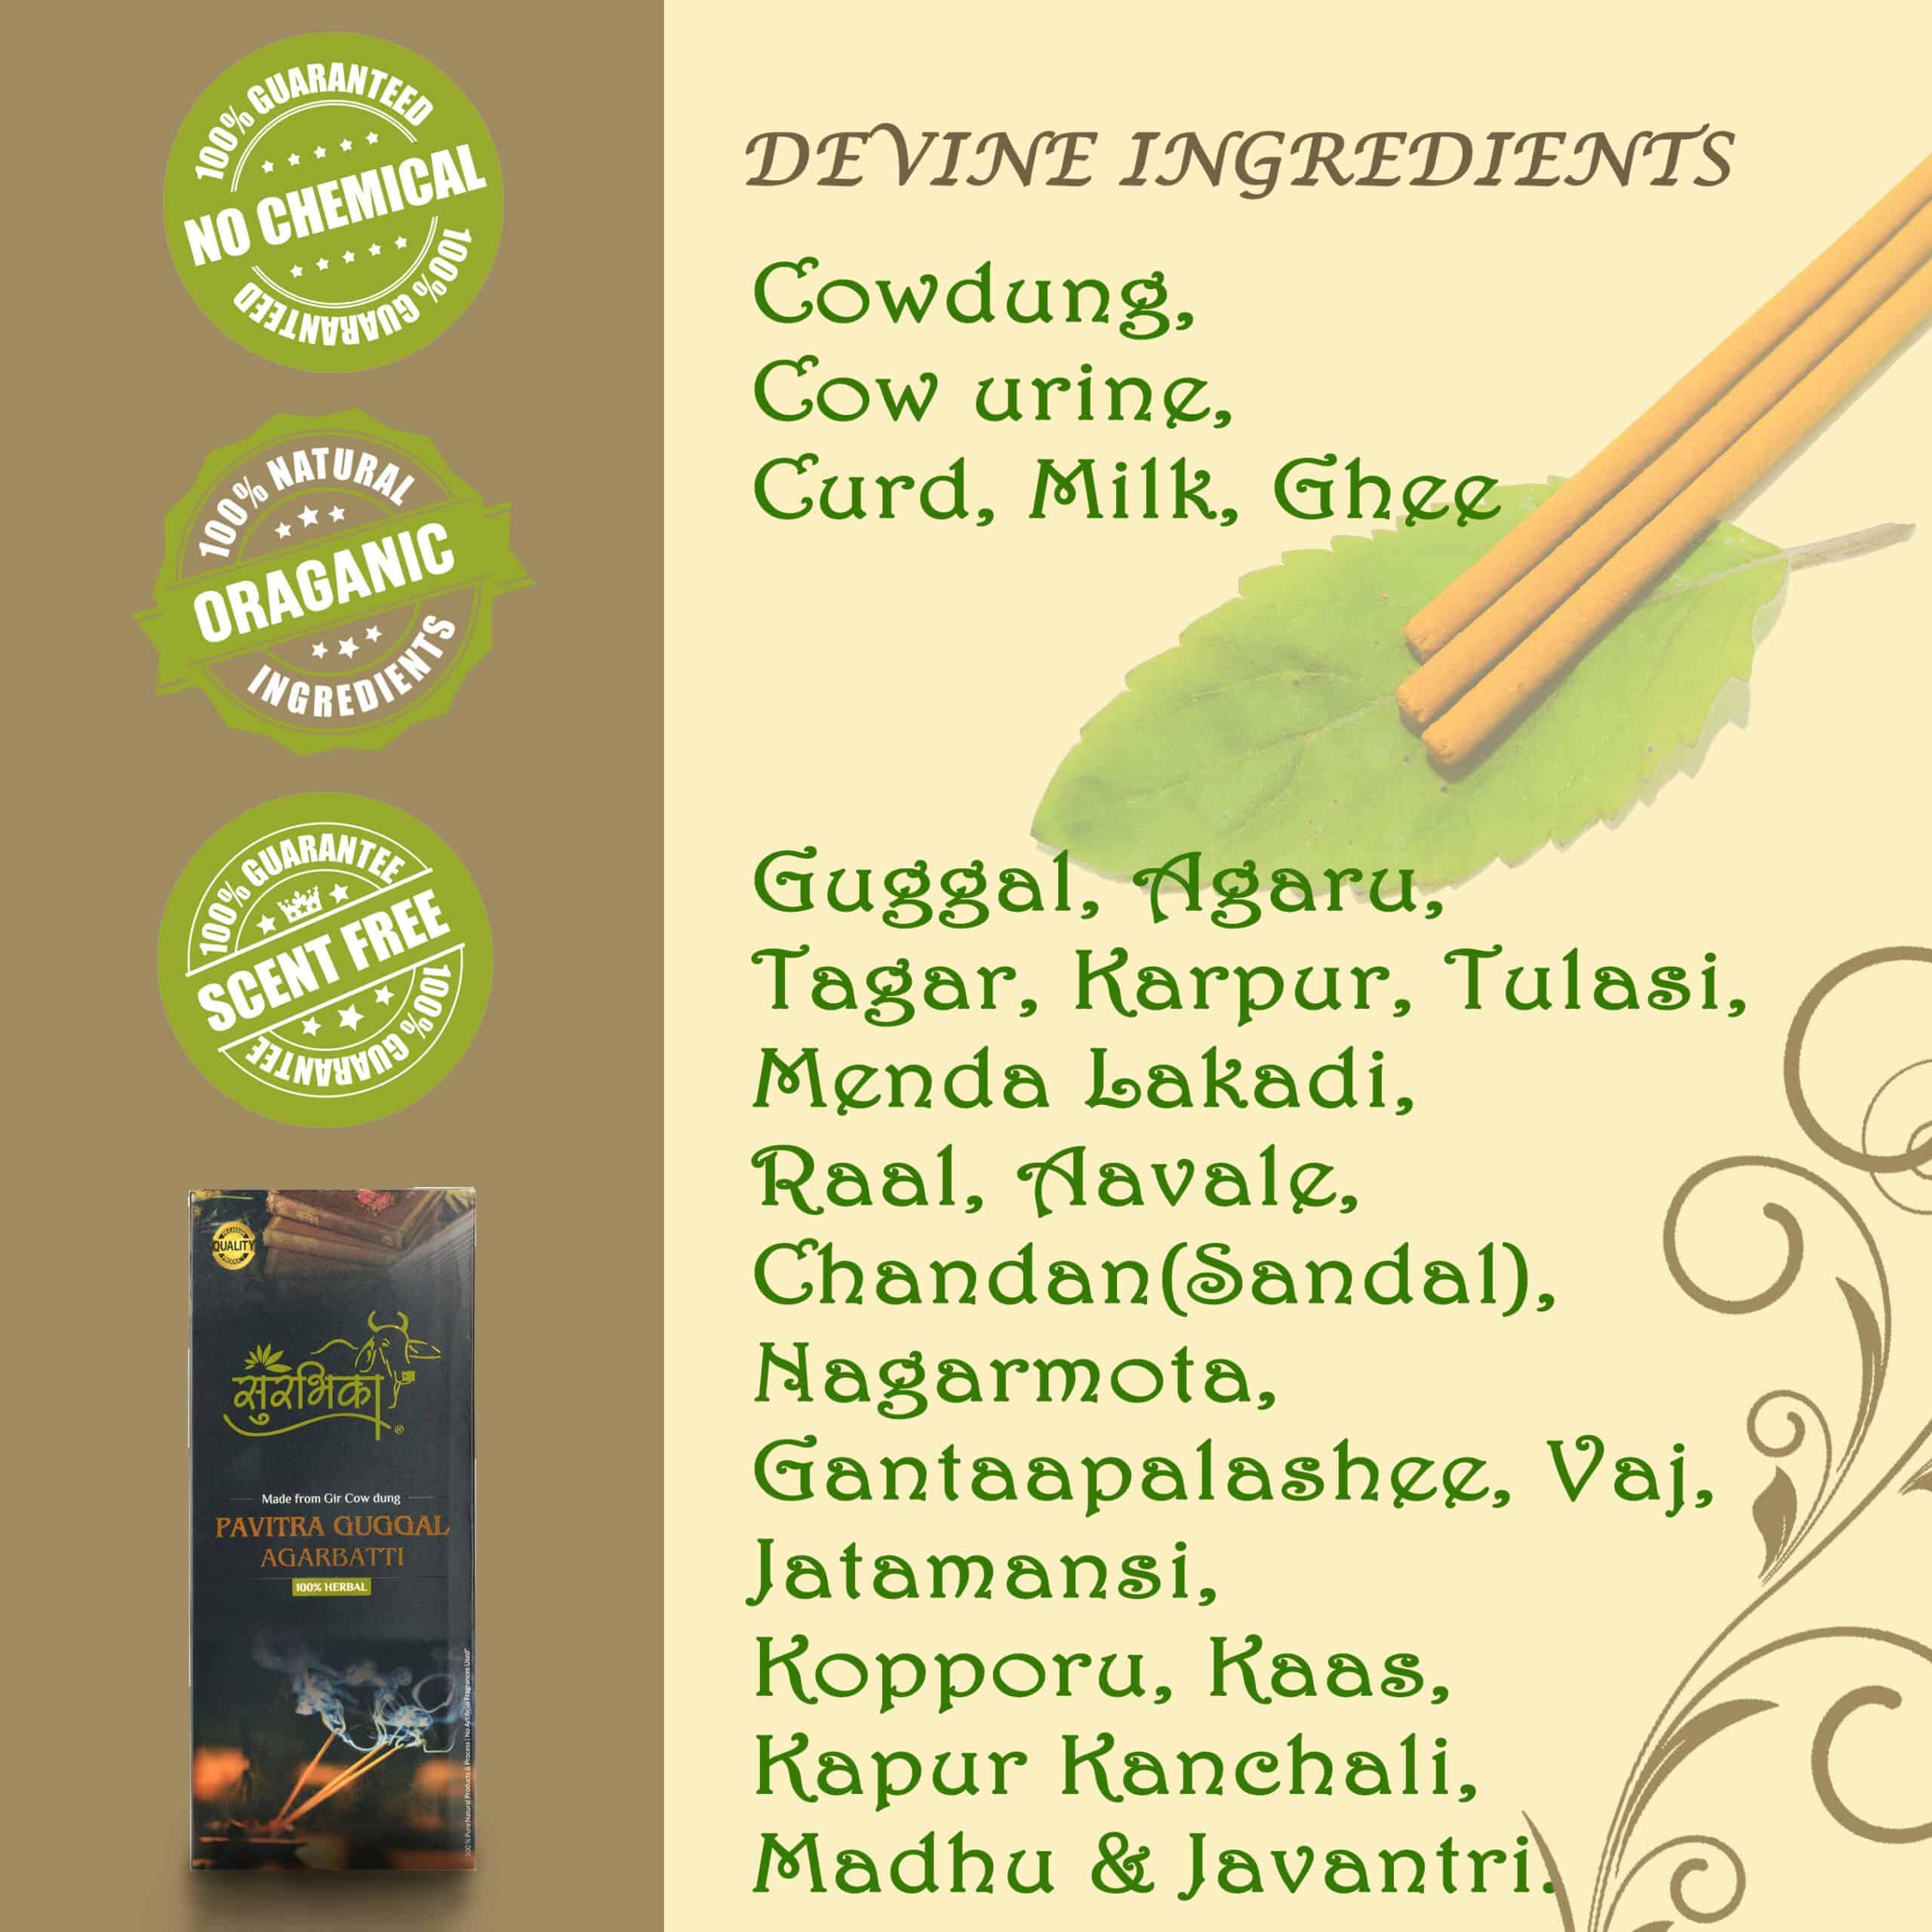 chemical free agarbatti ingredients